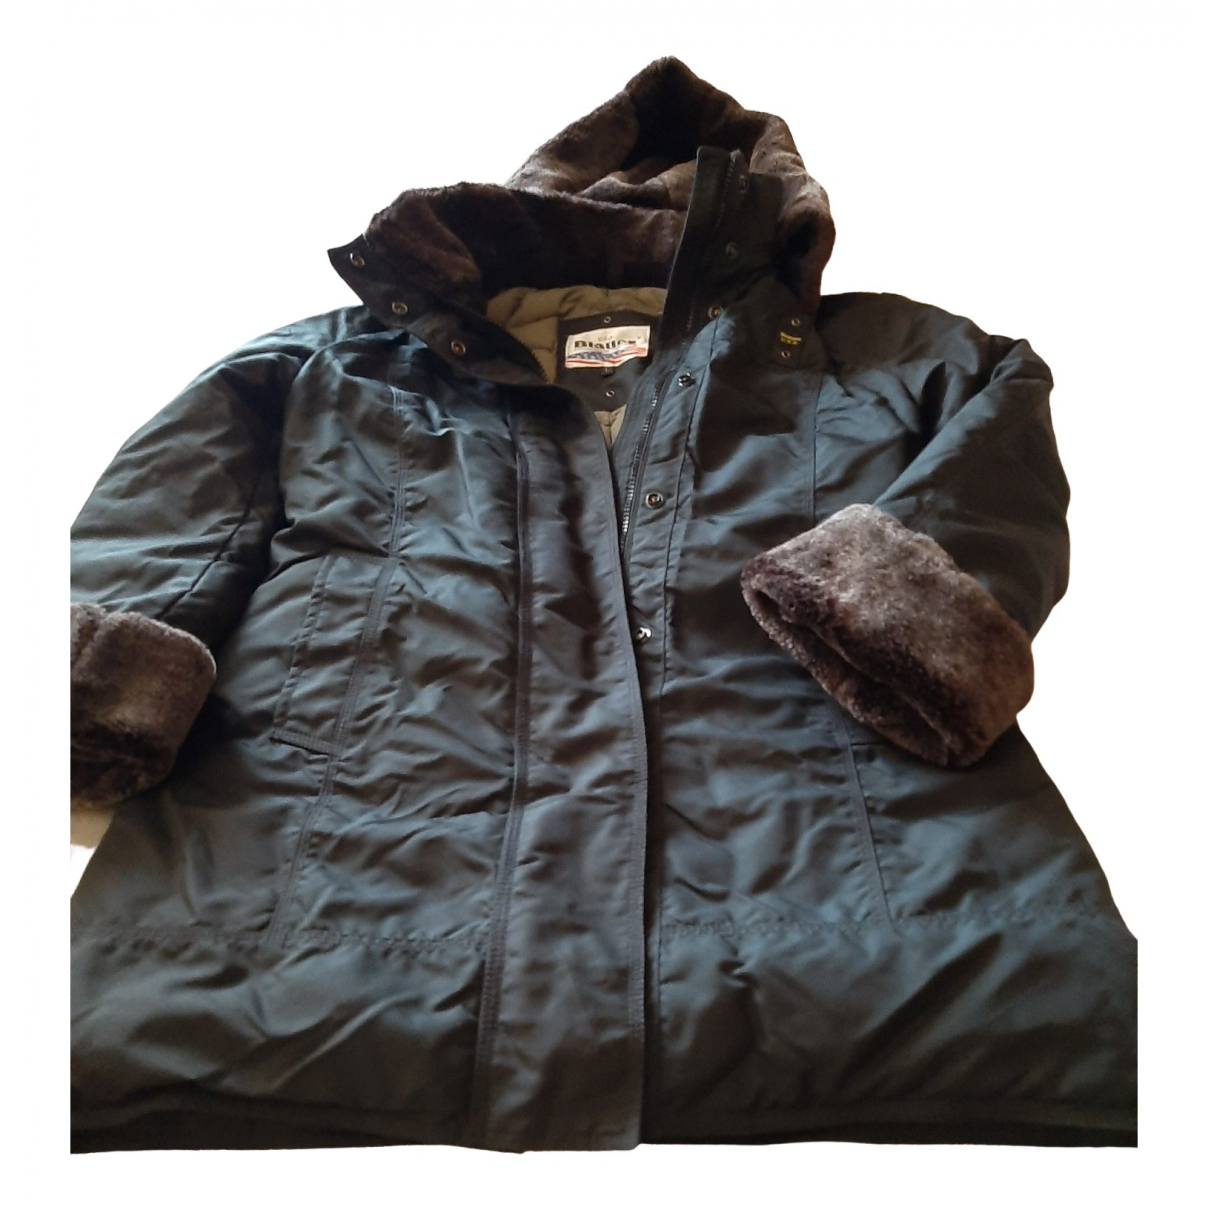 Blauer \N Black jacket for Women L International